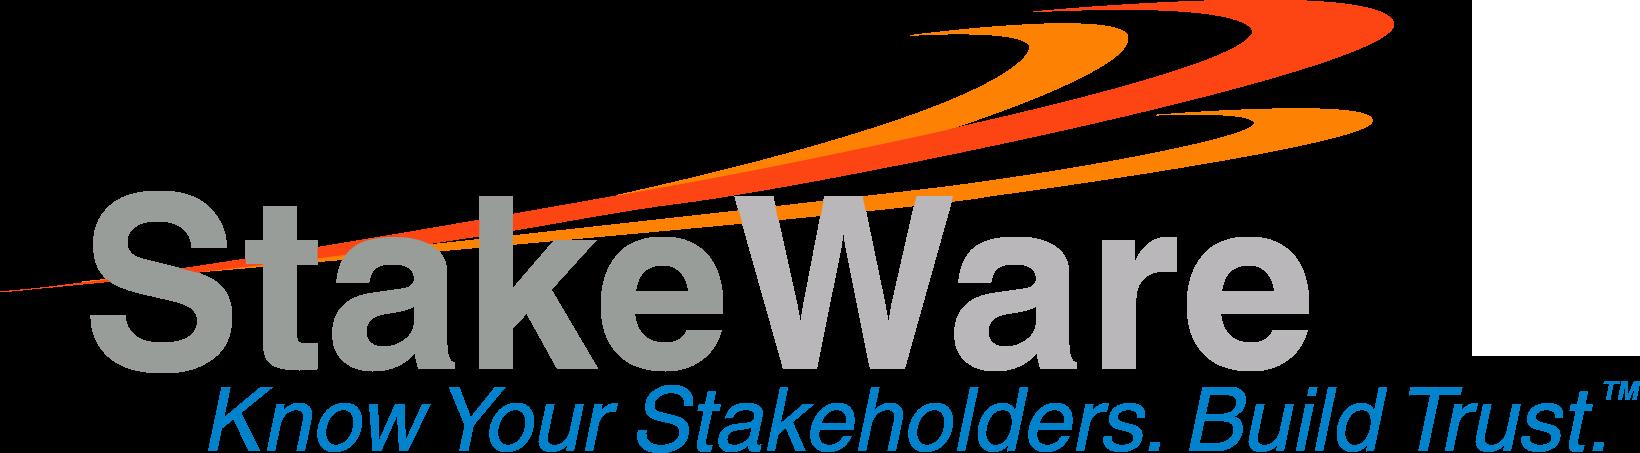 2018_10_23_sw-retina-logo copy.png